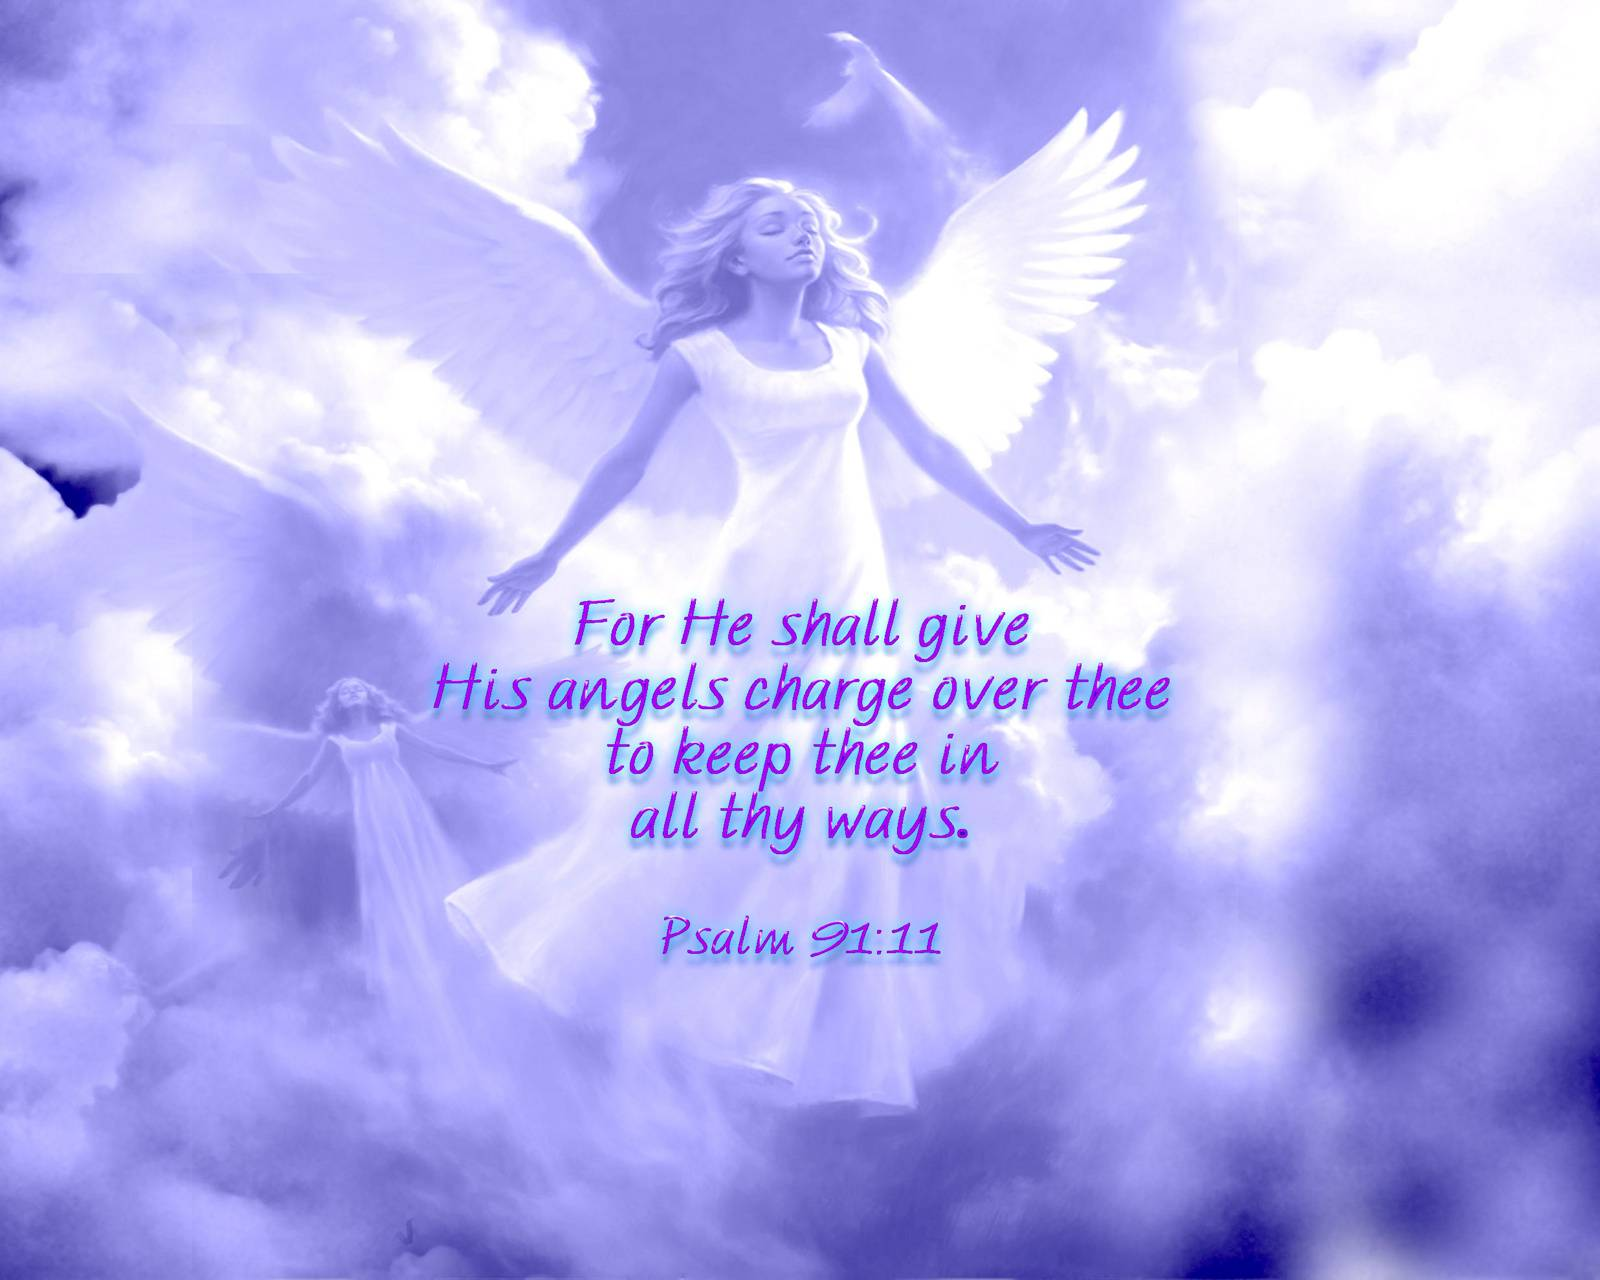 Psalm NinetyOneElevn